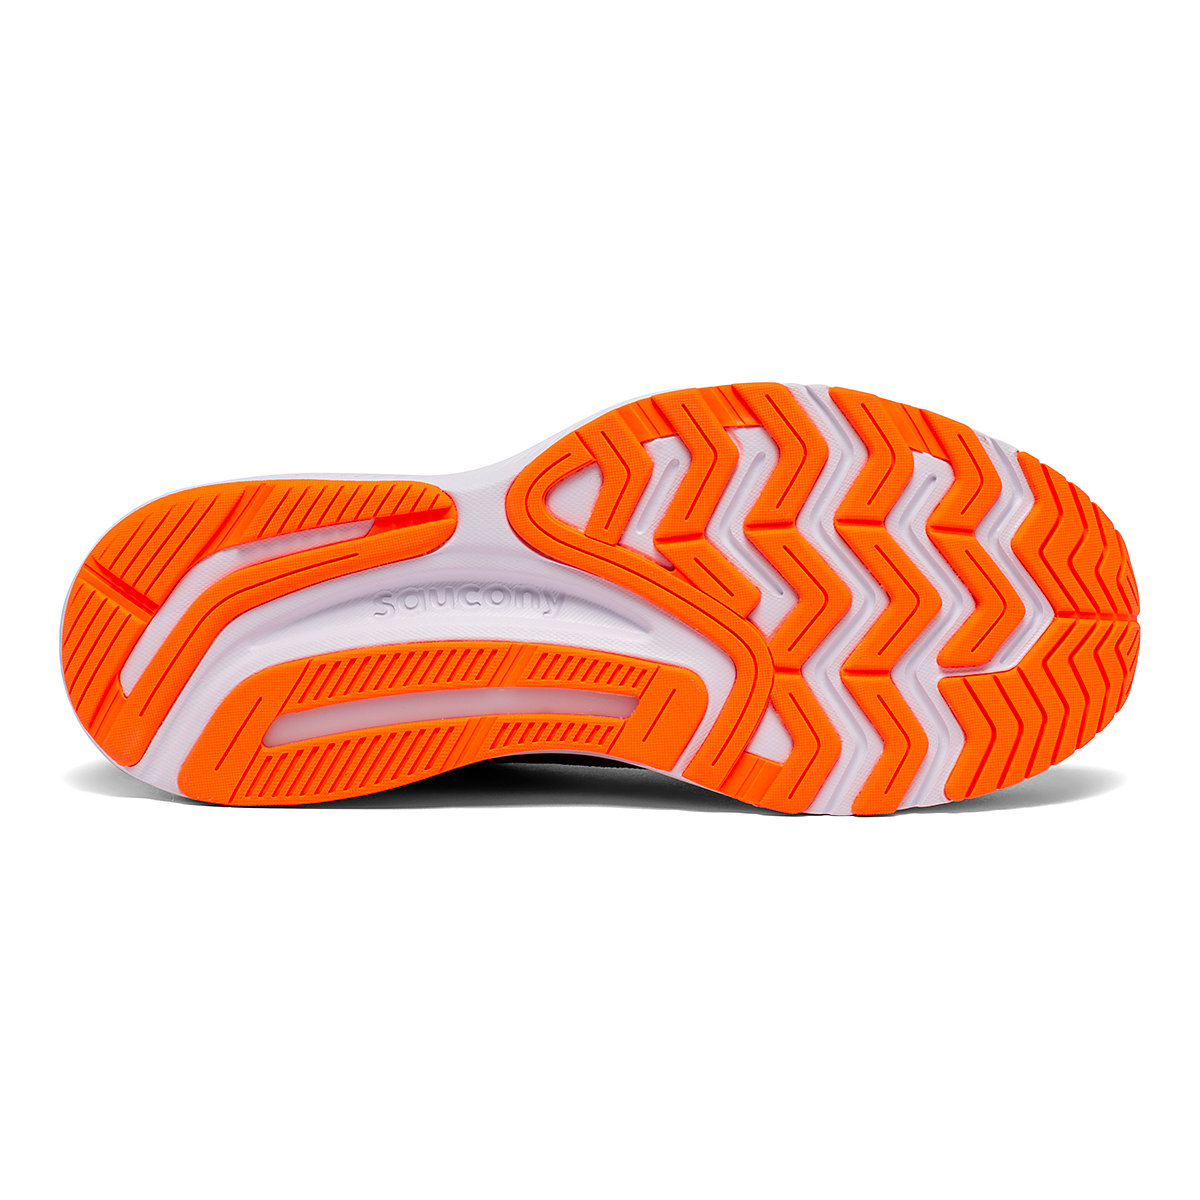 Men's Saucony Guide 14 Running Shoe - Color: Future/Black - Size: 7 - Width: Regular, Future/Black, large, image 5